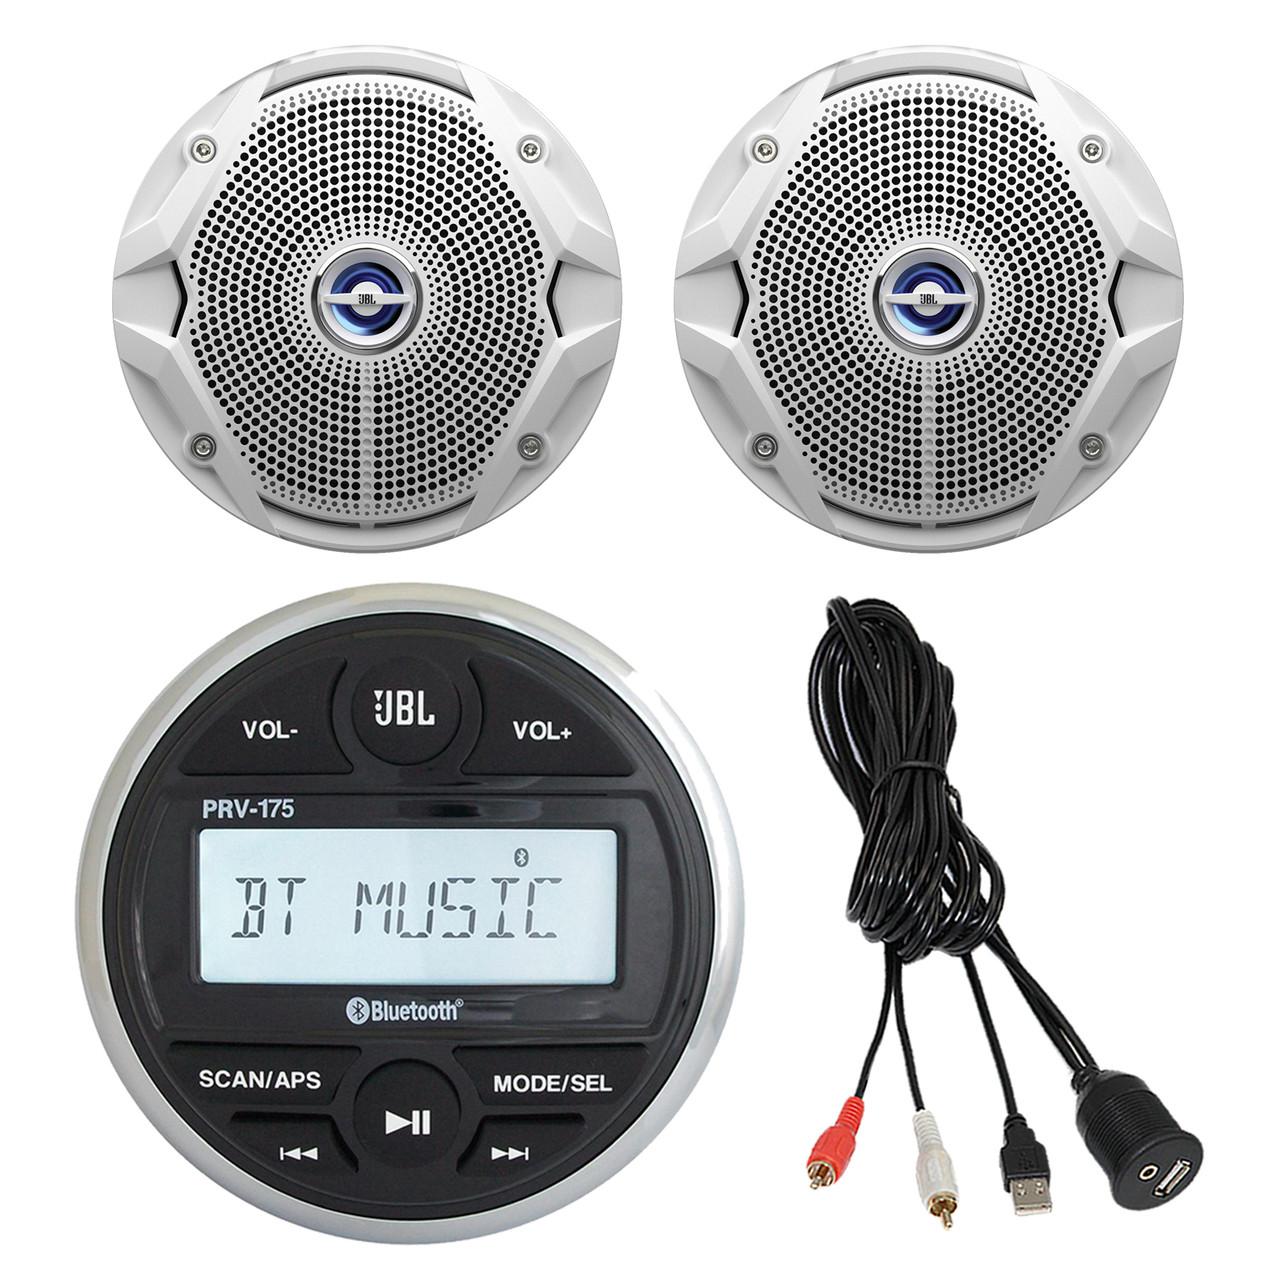 BRAND NEW JBL GAUGE STYLE STEREO MARINE AM//FM MP3 USB BLUETOOTH RECEIVER